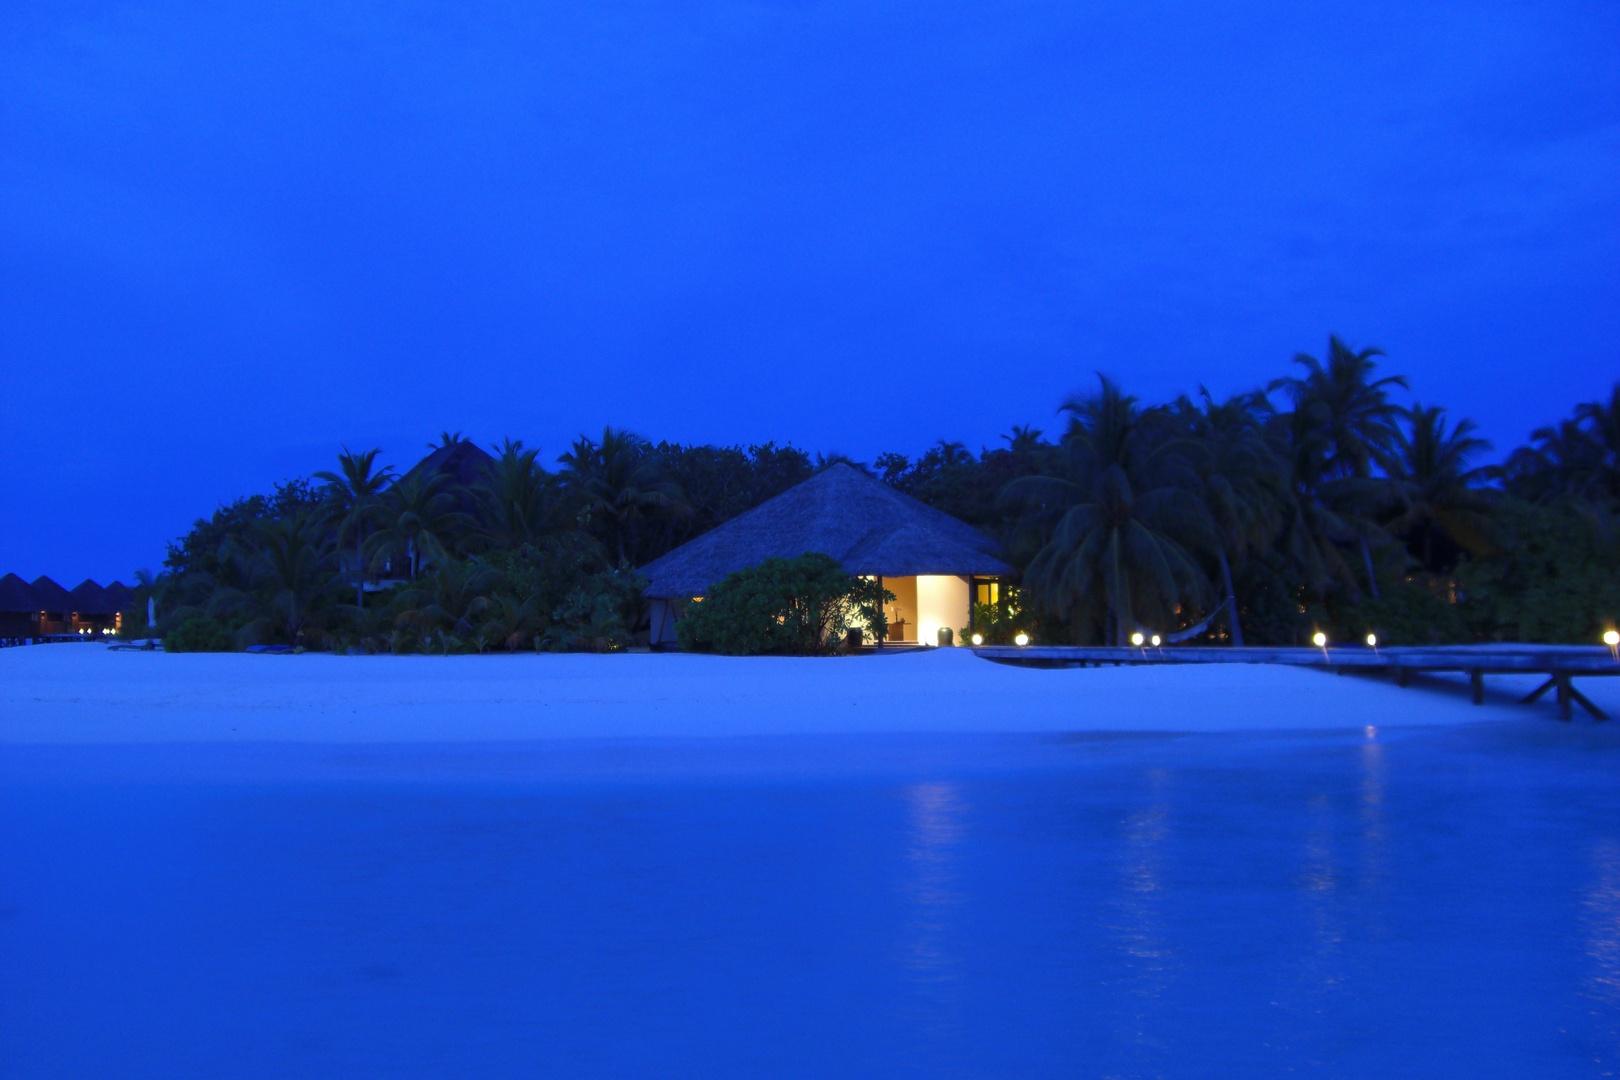 Traumstrände 3.5 (Malediven, Mirihi, Ari Atoll)